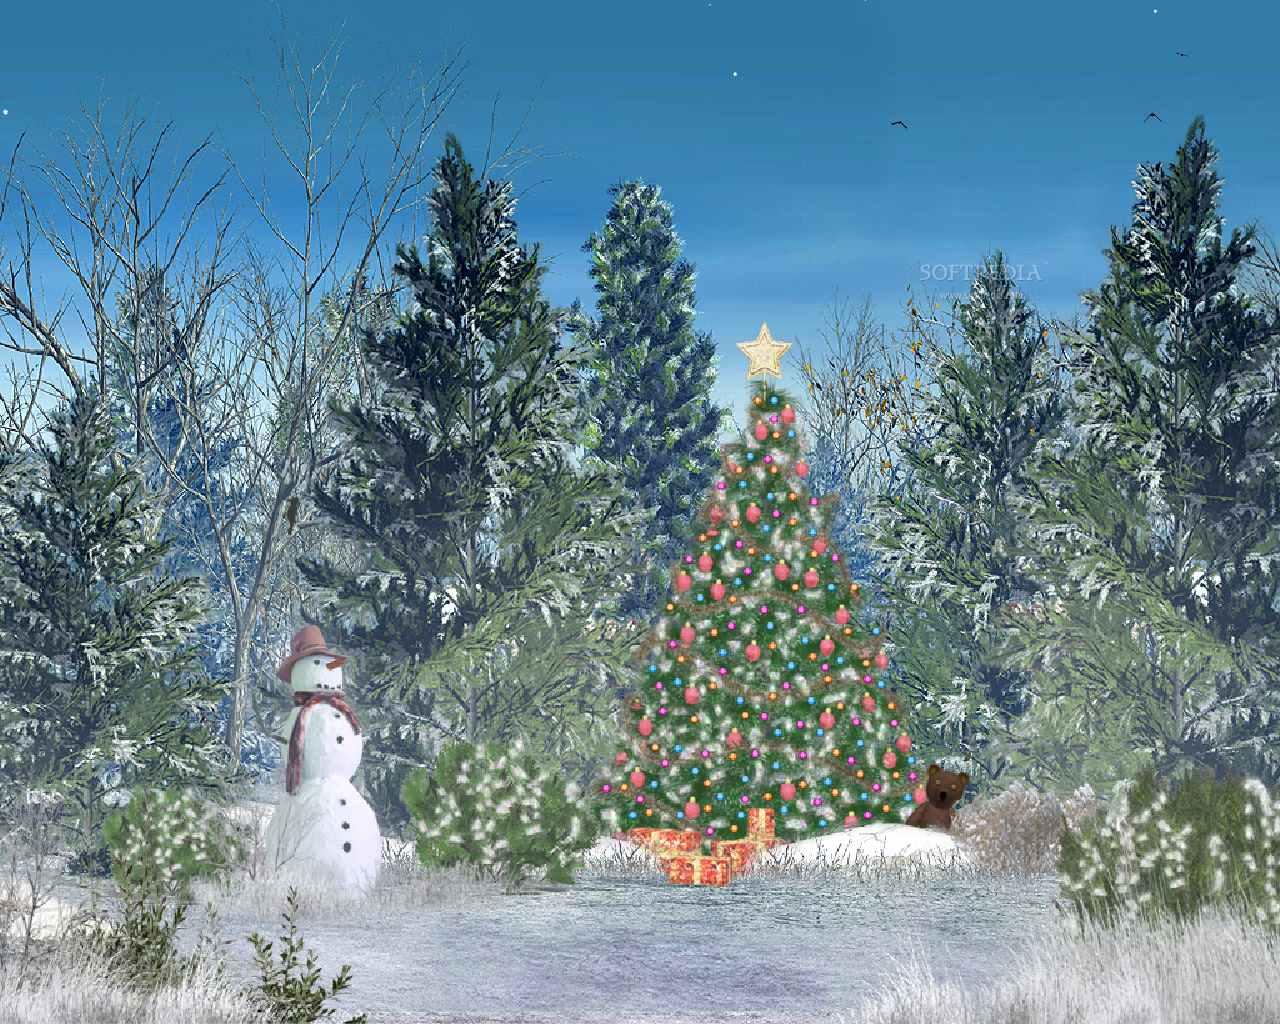 74] Desktop Christmas Backgrounds on WallpaperSafari 1280x1024